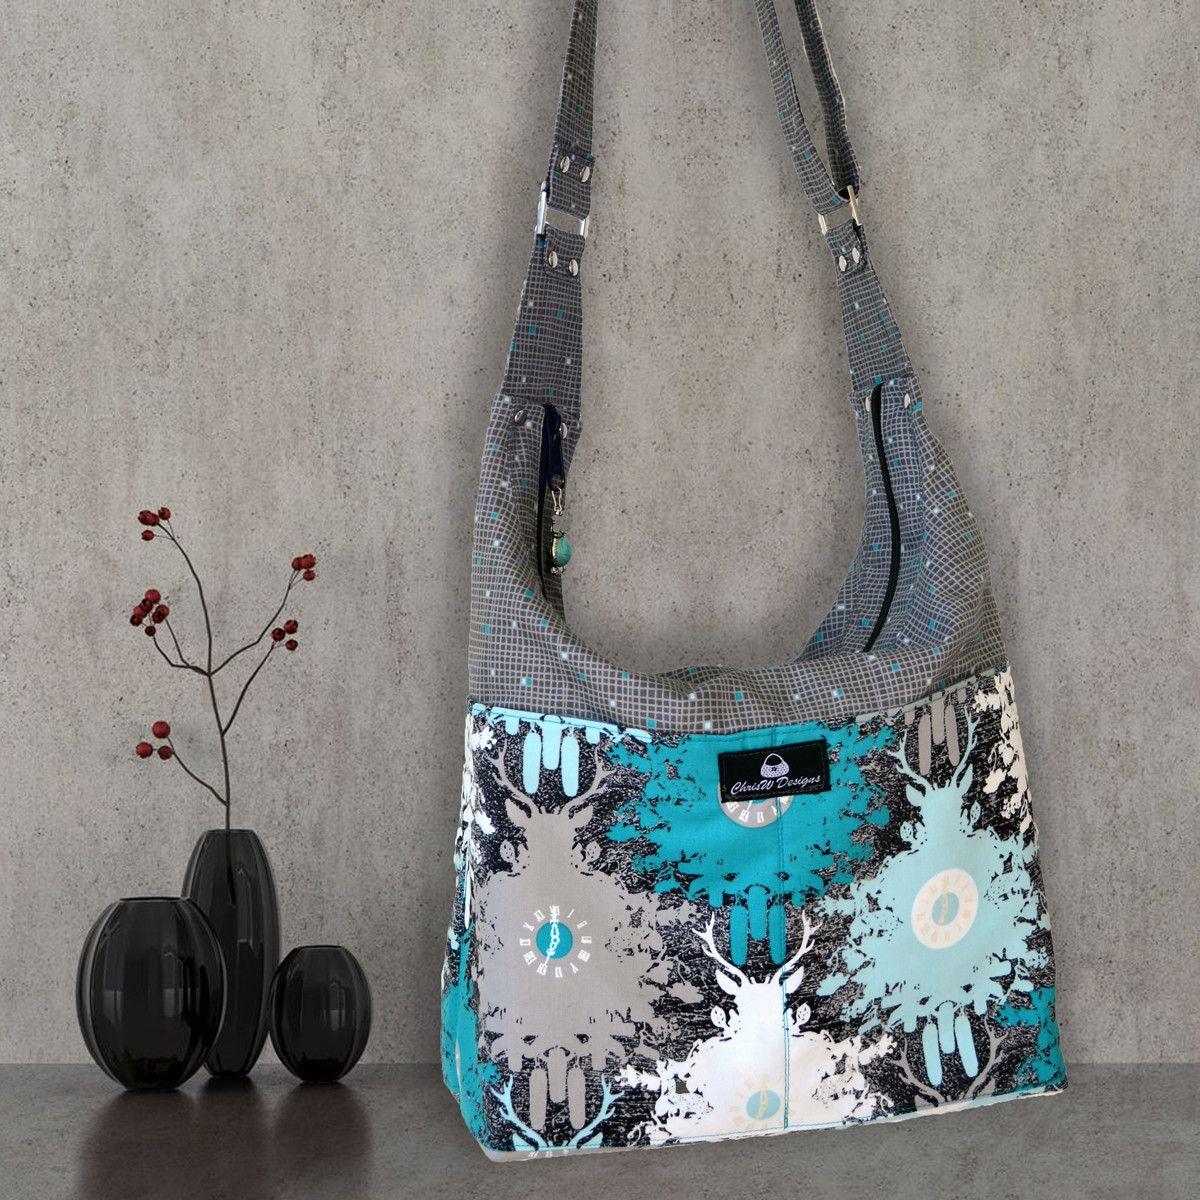 Snazzy Slouch - ChrisW Designs For Unique Designer Bag Patterns - 4